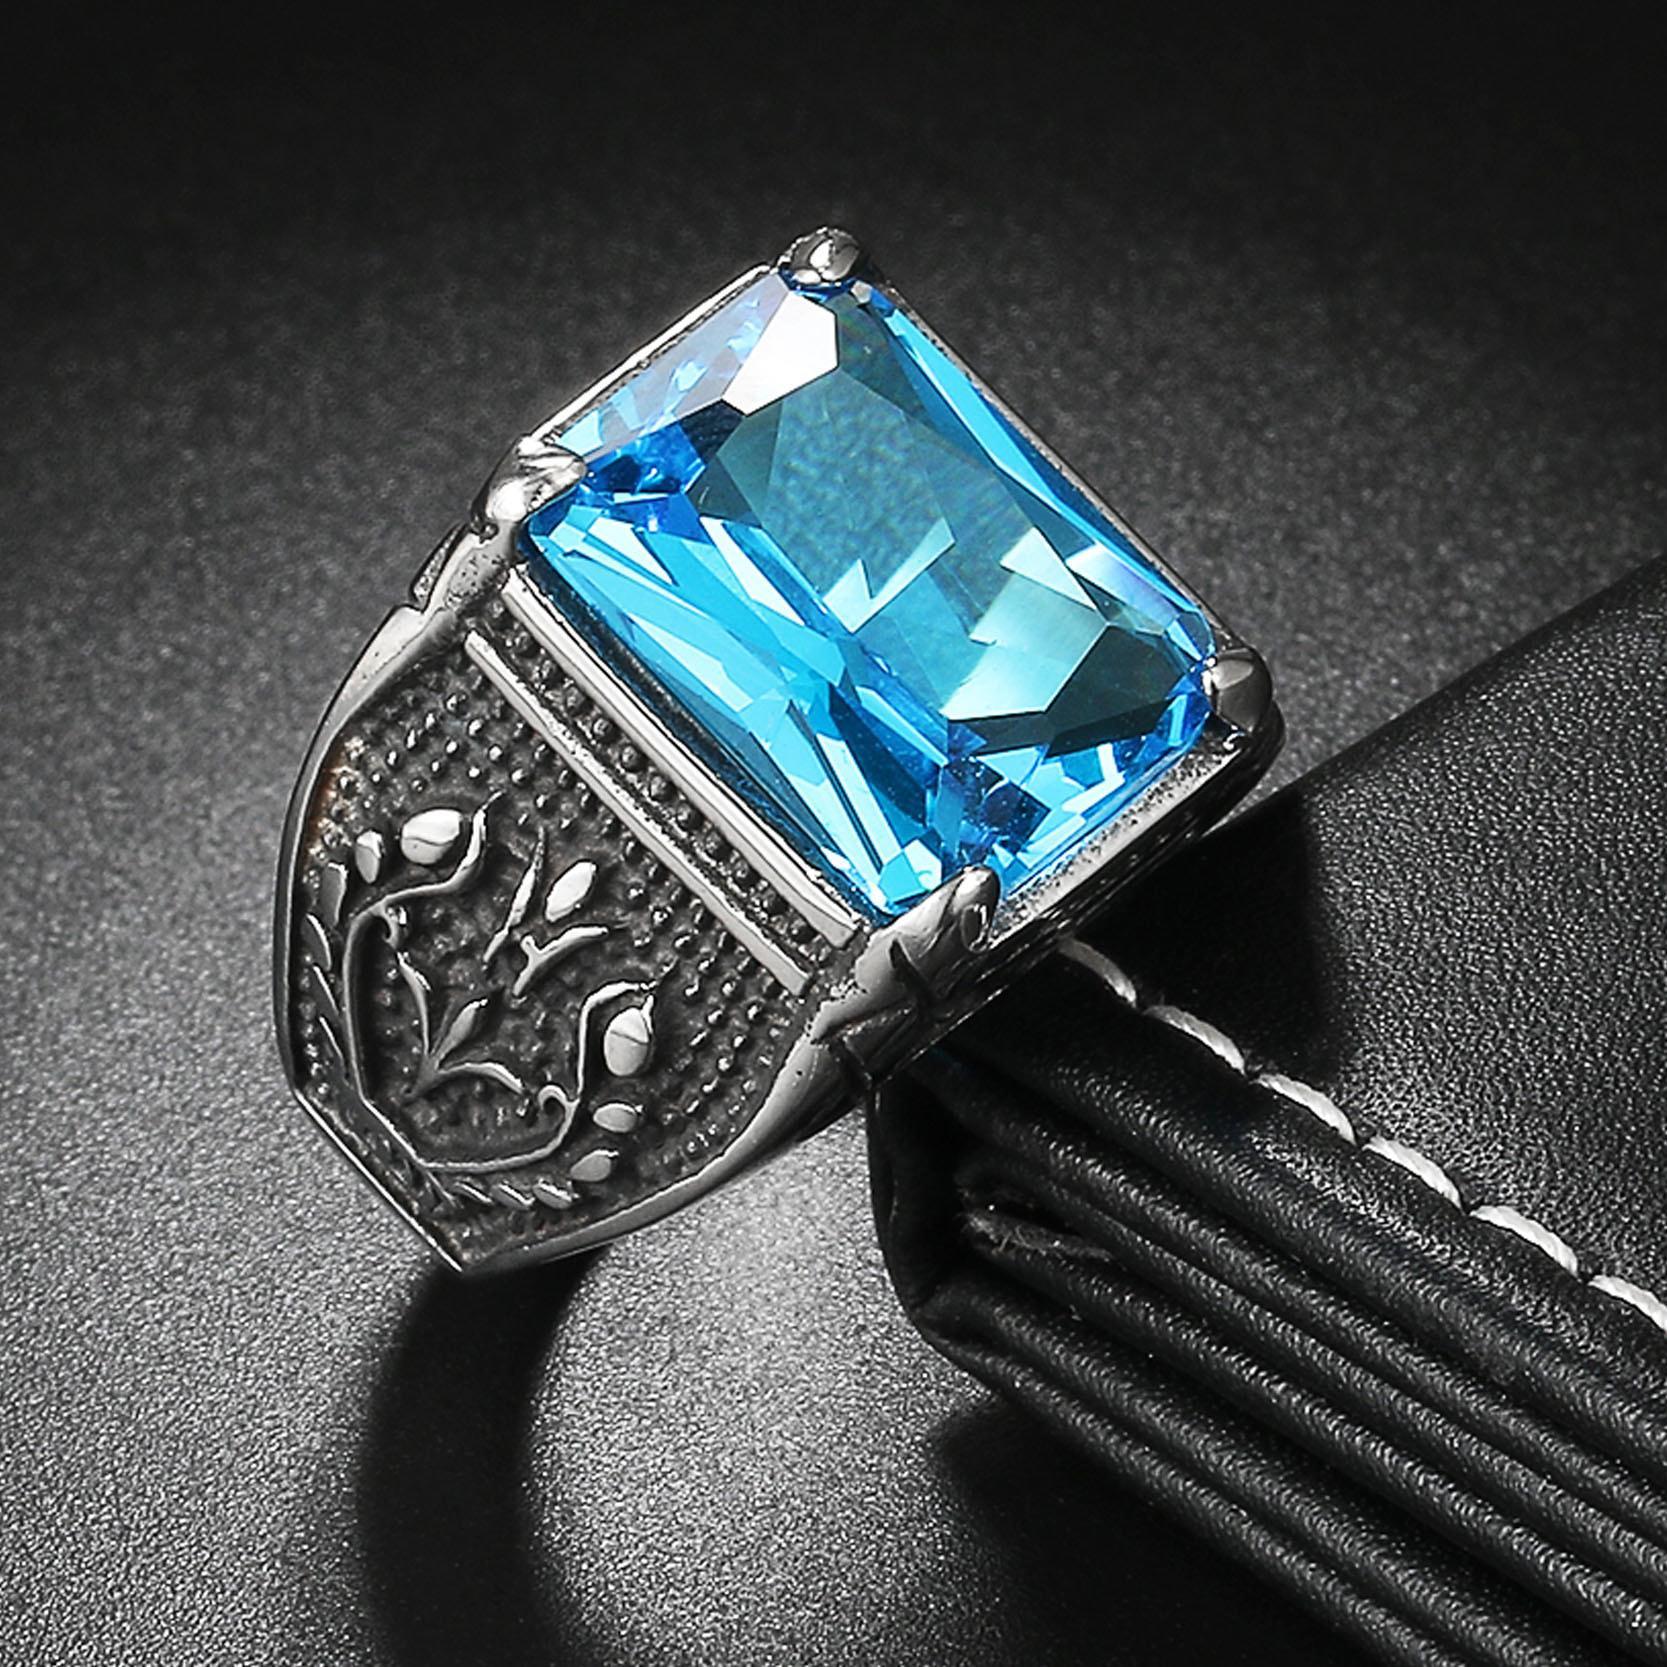 Rp 235.000. Diskon Promo Perhiasan Aksesoris Cincin Pria Vintage CZ Stone Punk Style 316L Titanium Steel ...